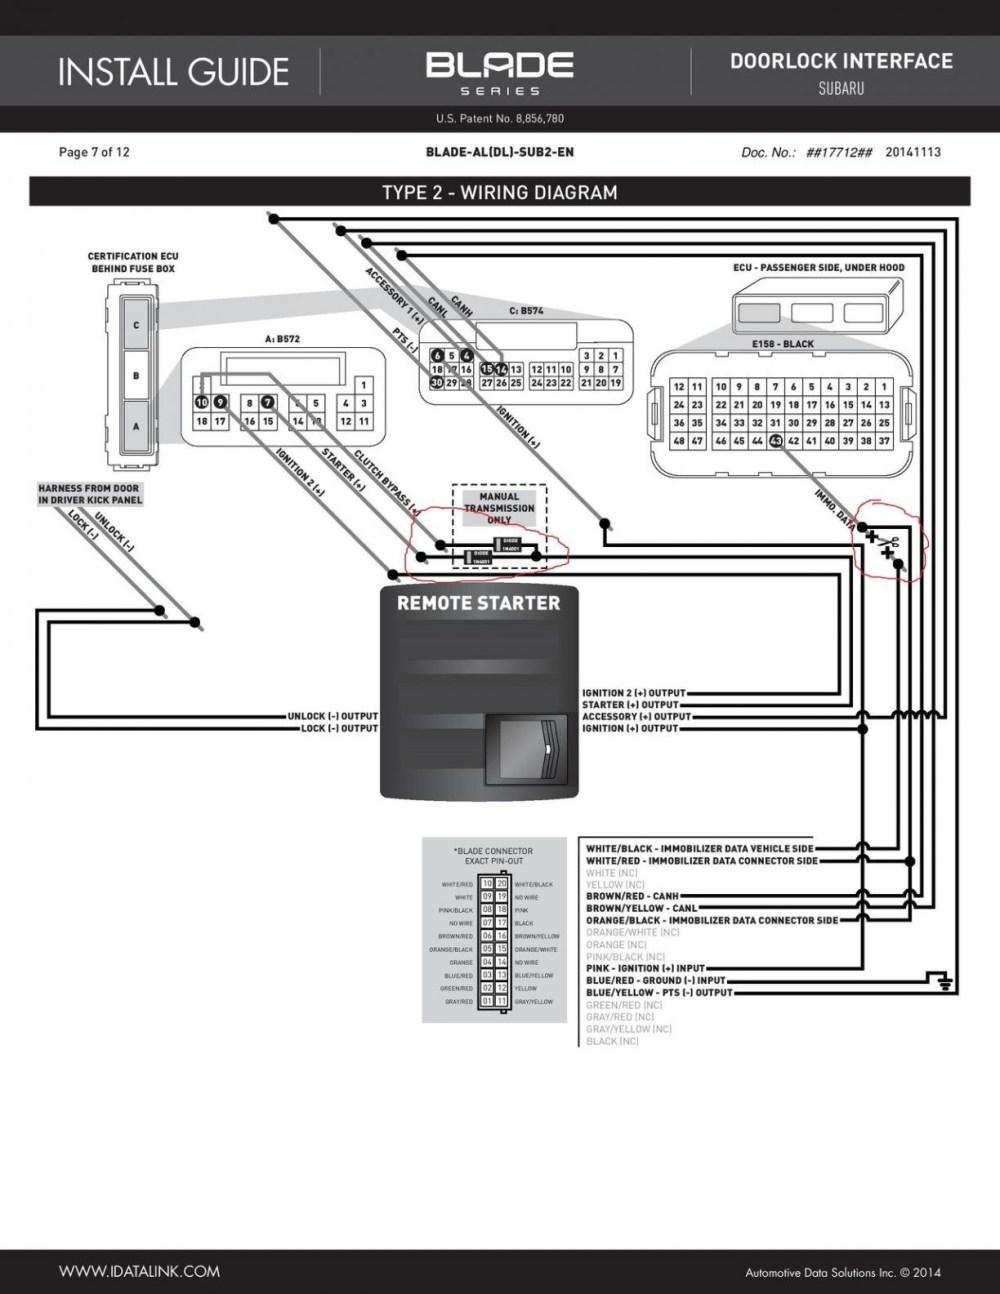 medium resolution of remote starter wiring diagrams modern gmdlbp wiring diagram s best for wiring diagram of remote starter